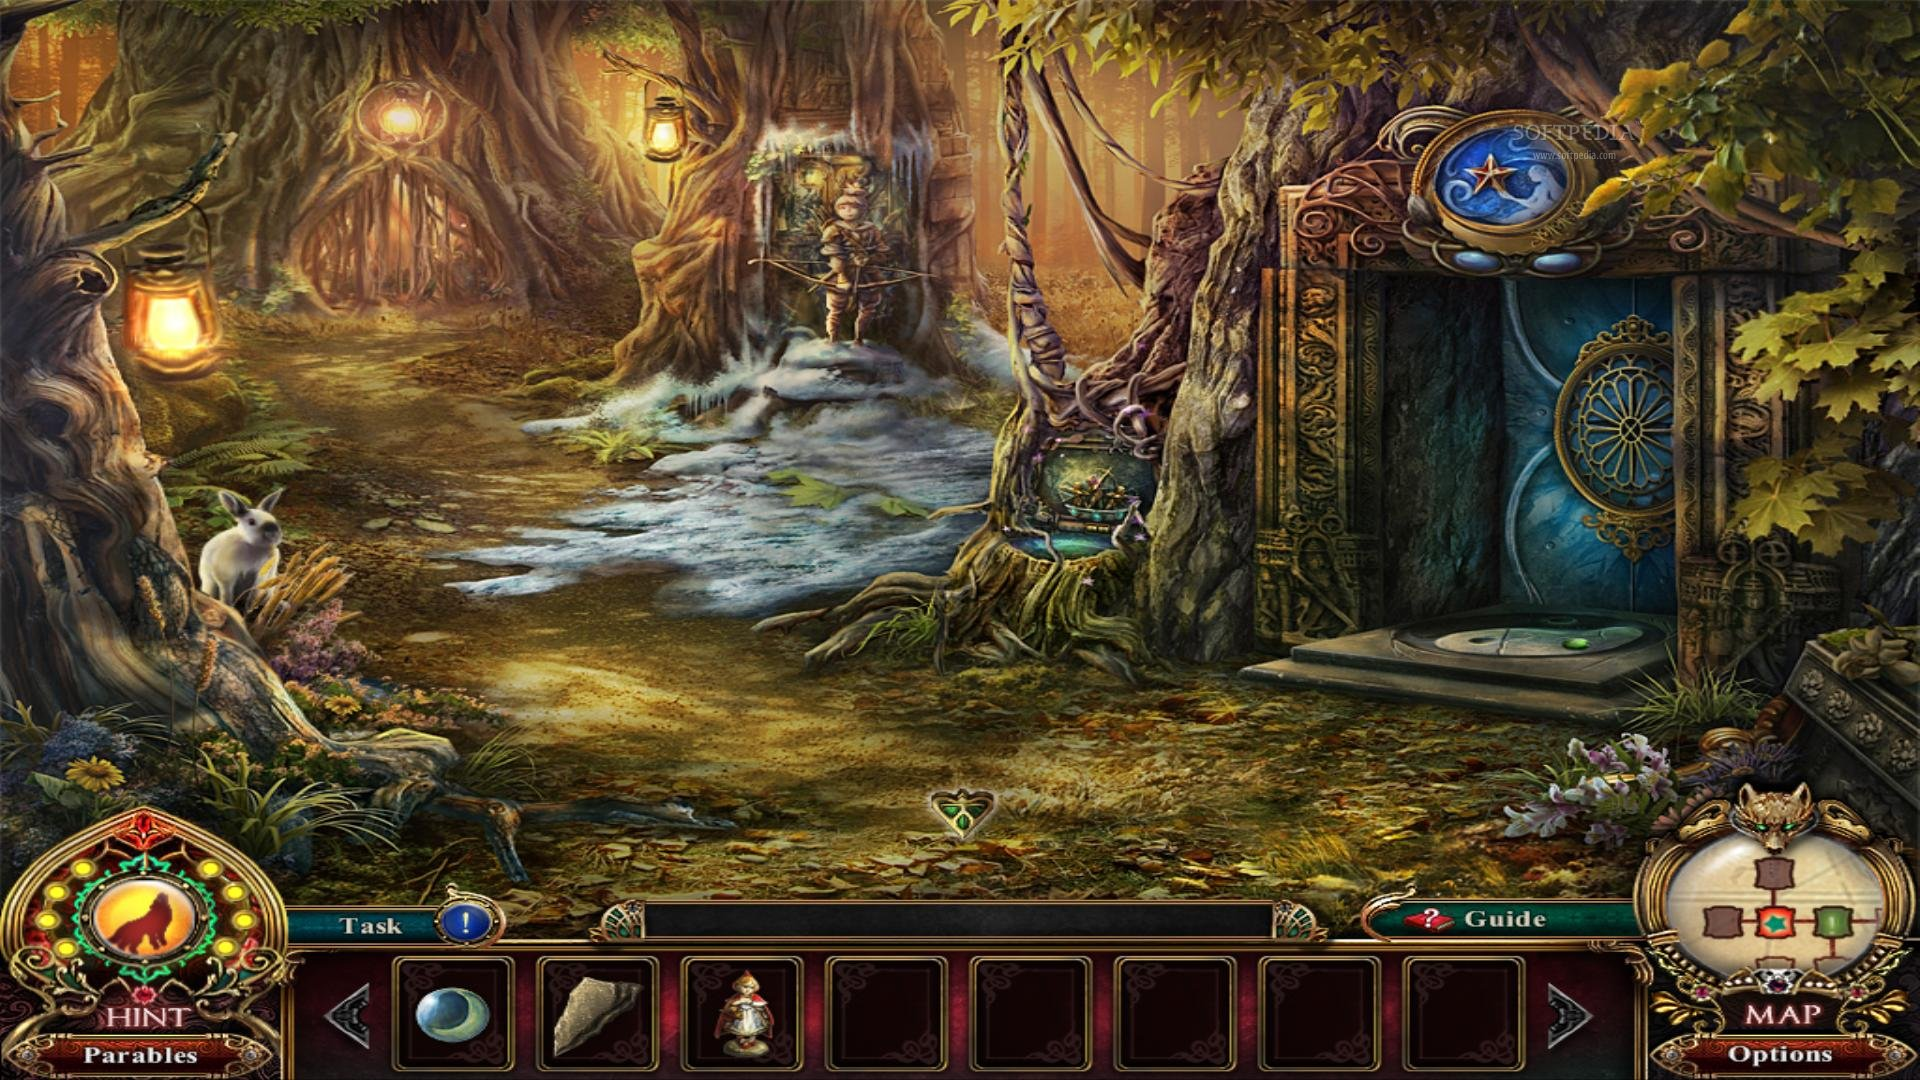 Dark parables fantasy game r wallpaper 1920x1080 - Fantasy game wallpaper ...